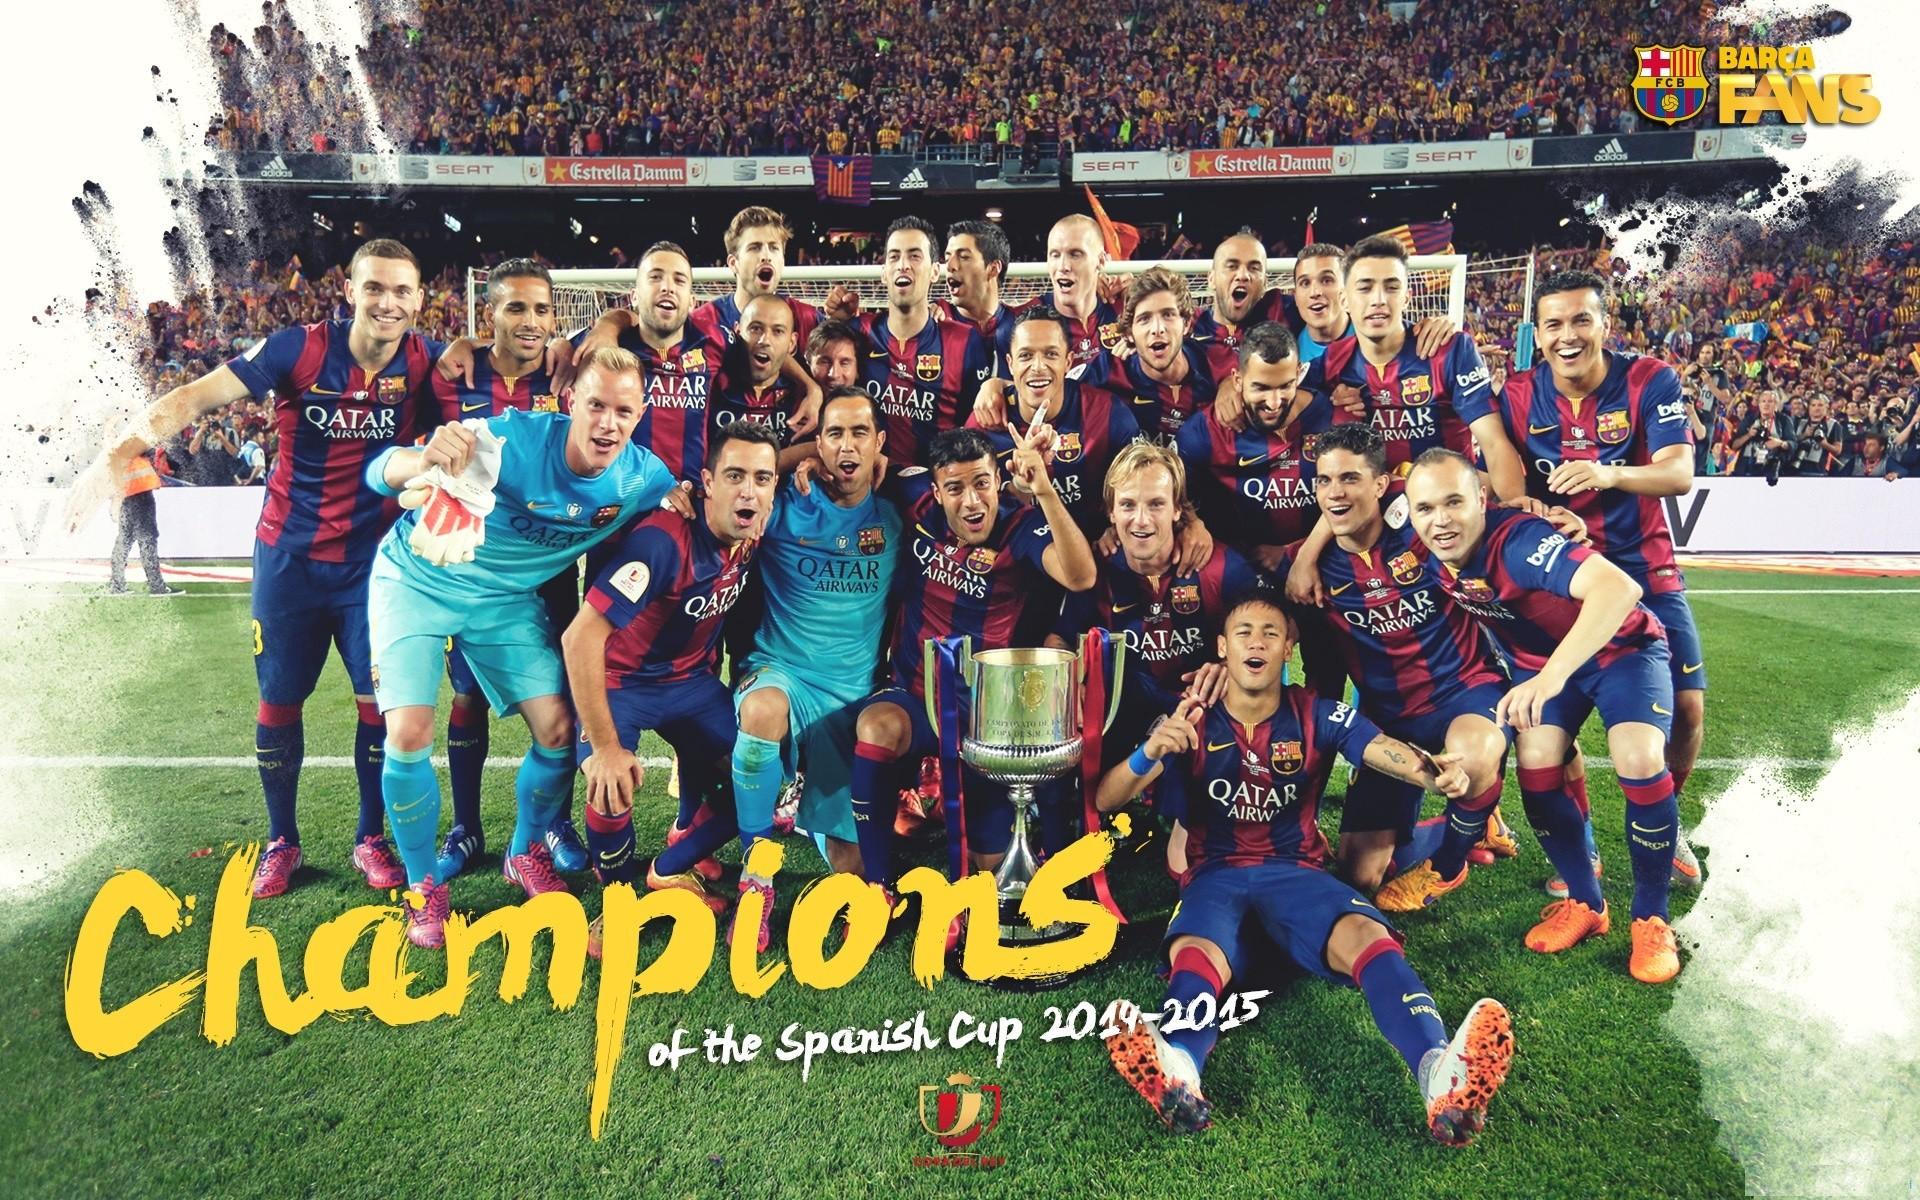 1920x1080 Pro Evolution Soccer 2016 PC FC Barcelona VS Real Madrid Gameplay - YouTube